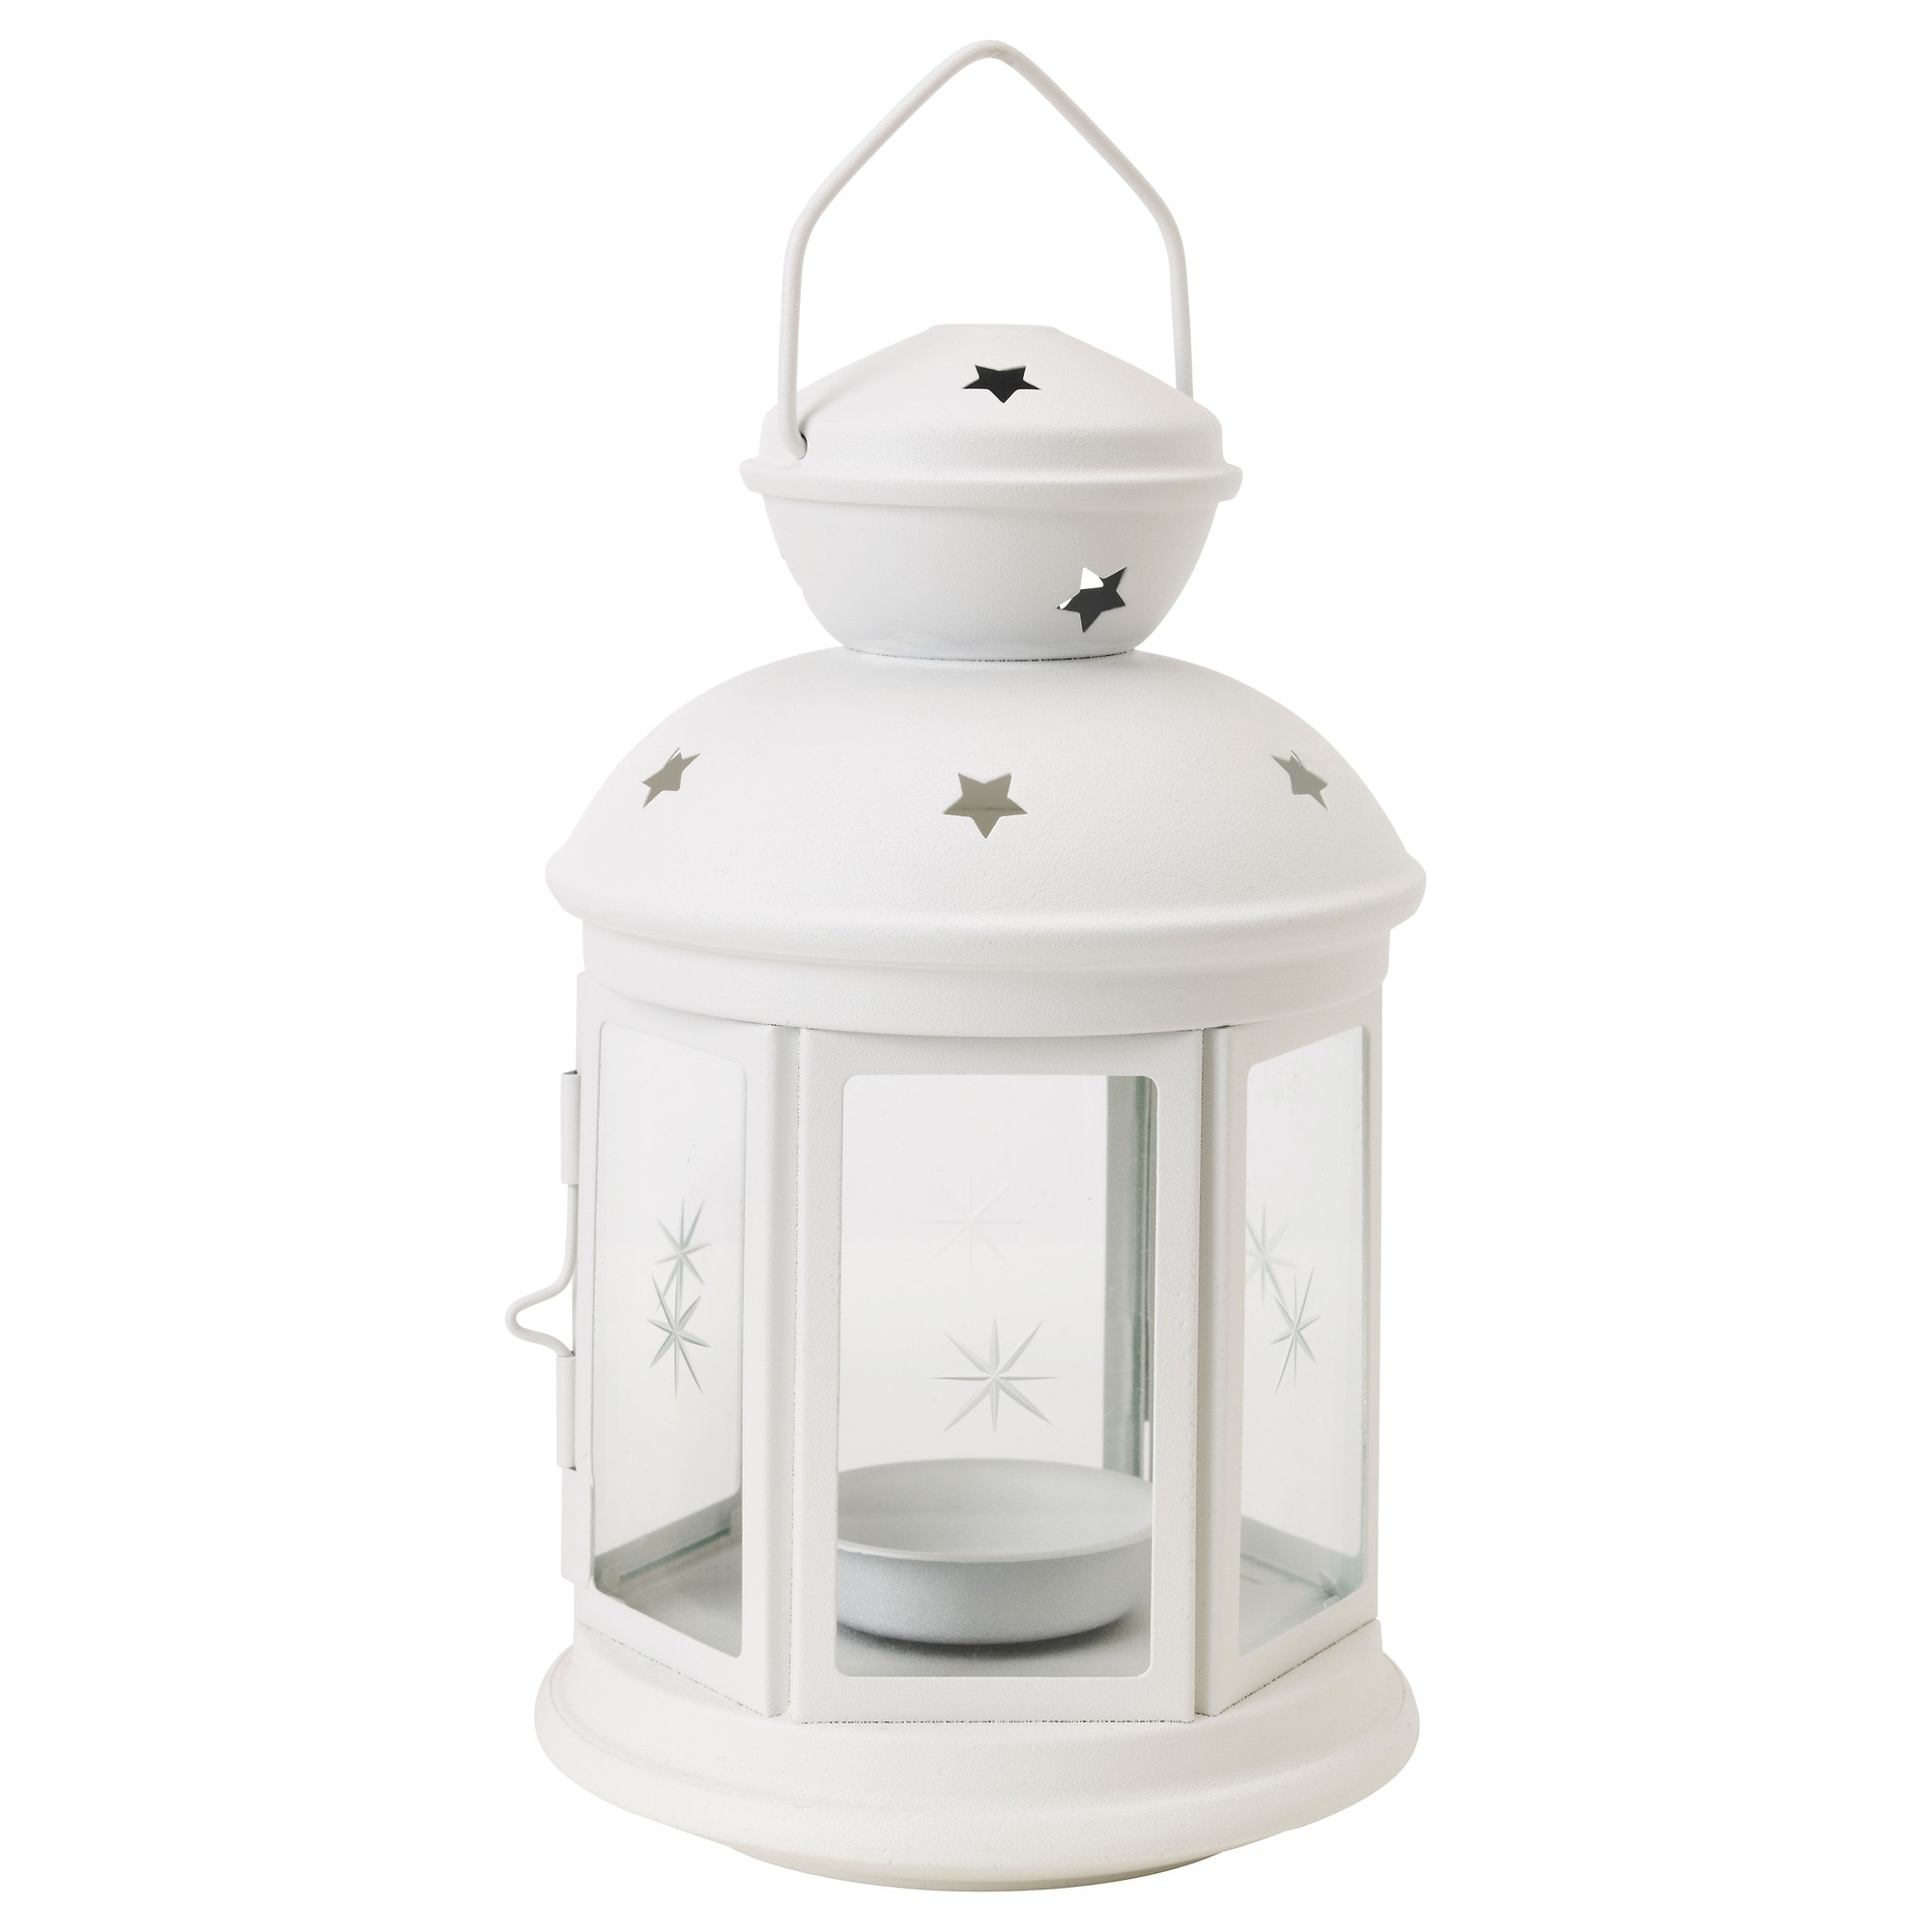 Rotera Lantern For Tealight - Ikea with regard to Ikea Outdoor Lanterns (Image 16 of 20)